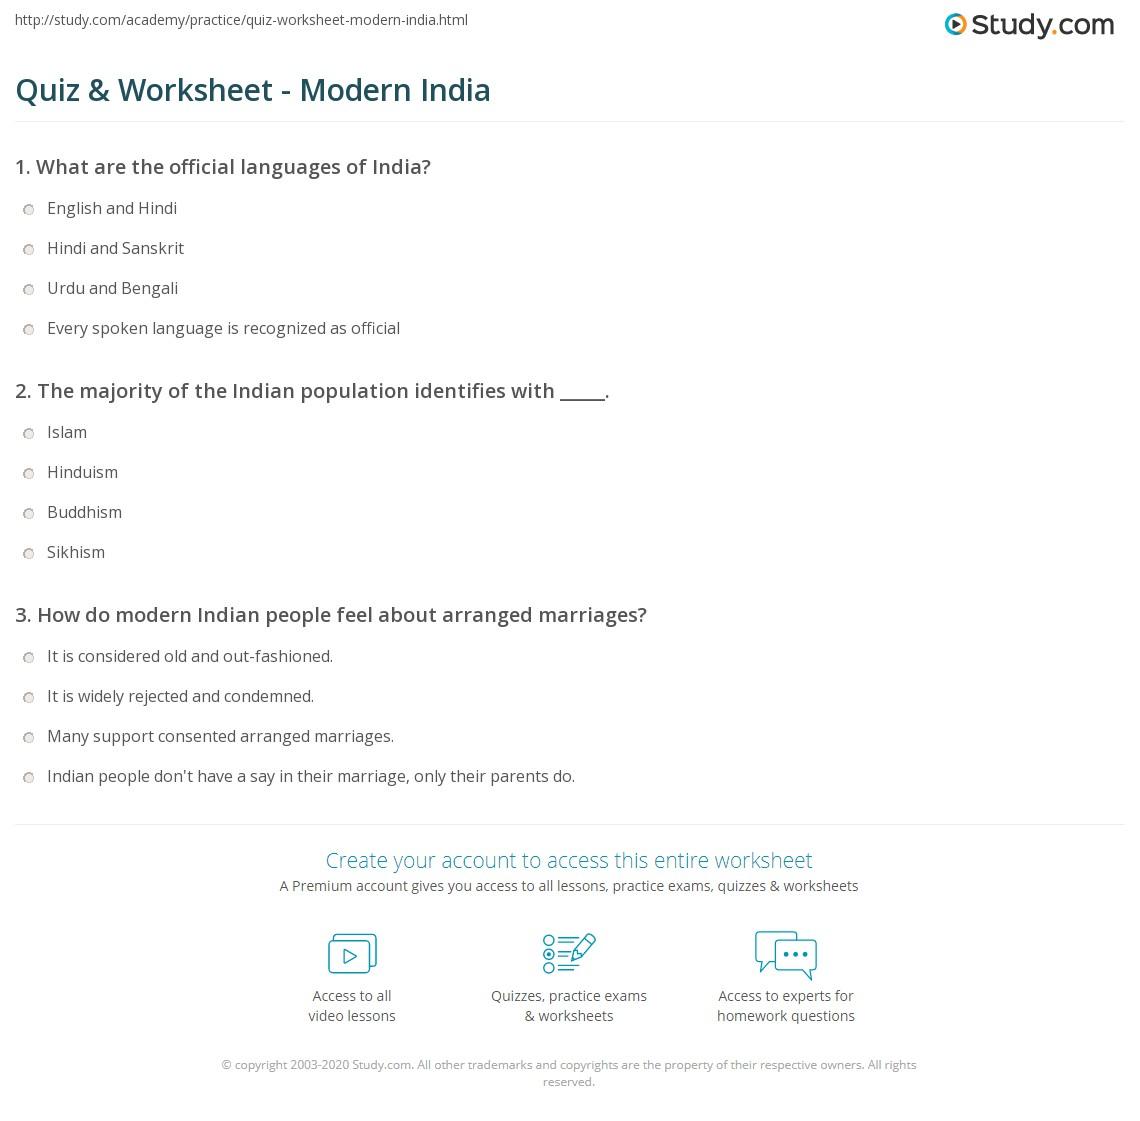 Quiz & Worksheet - Modern India | Study com